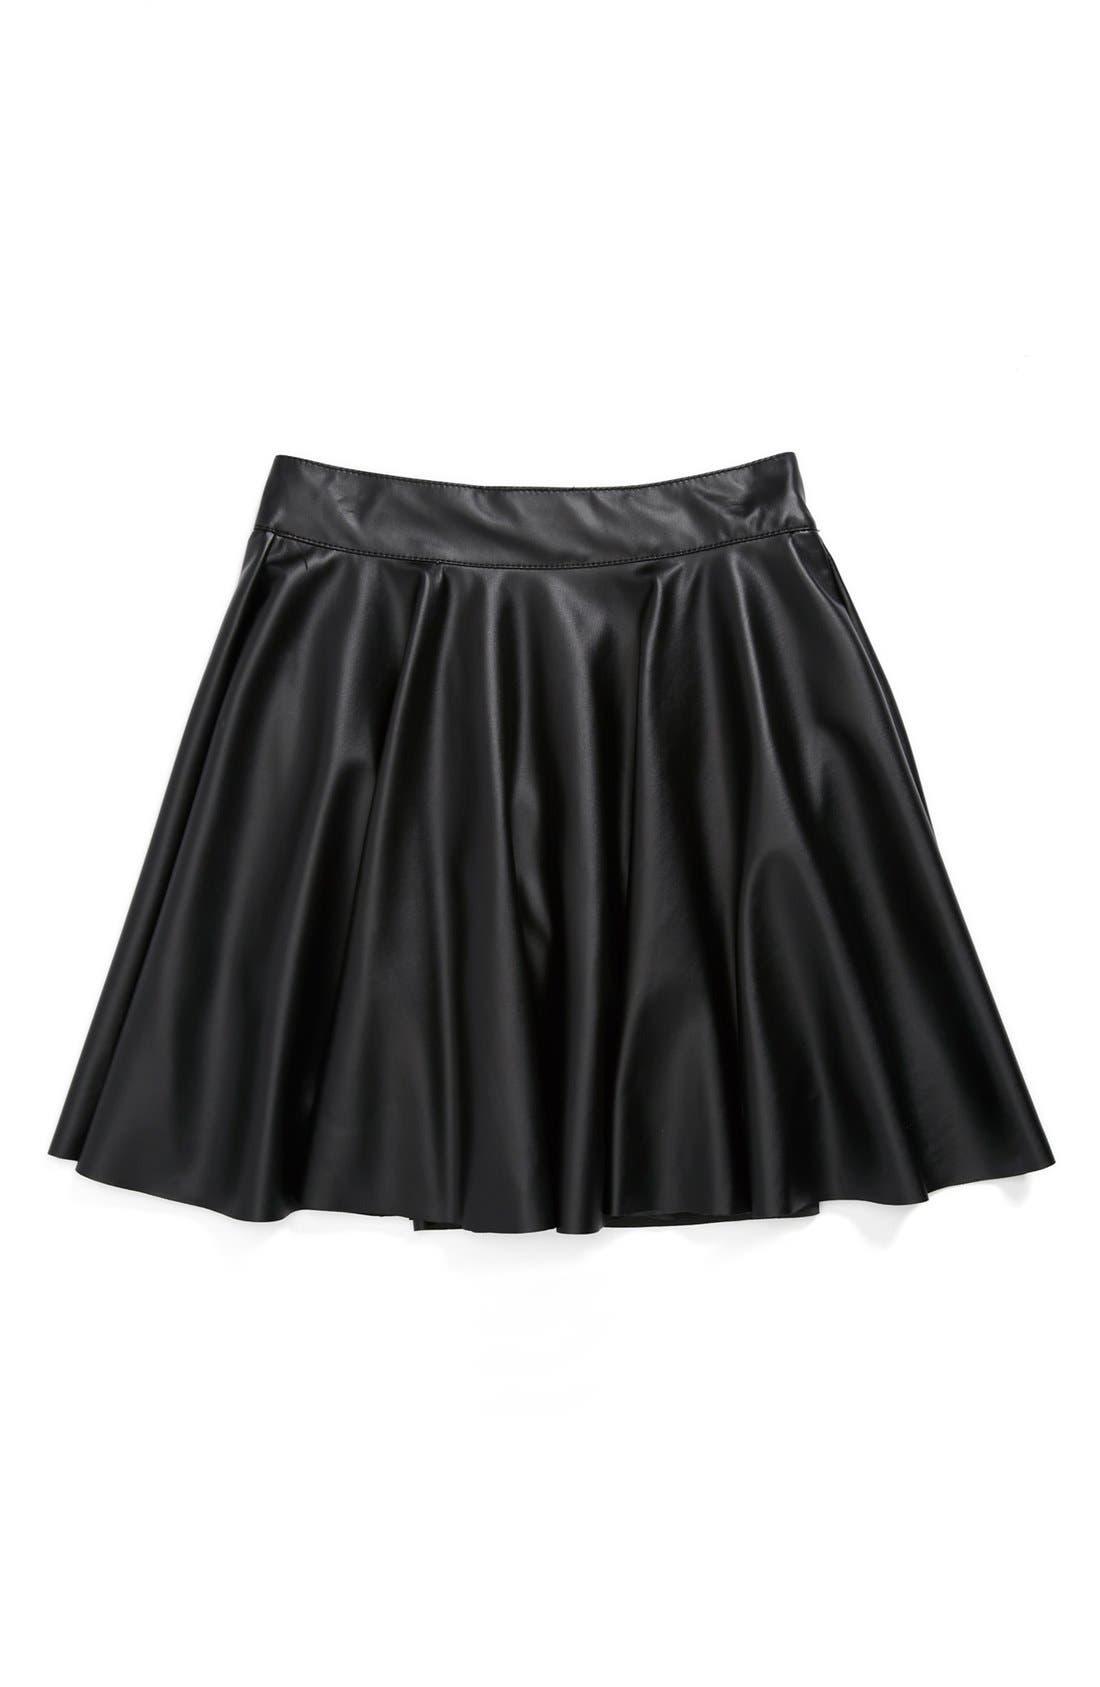 Main Image - Un Deux Trois 'Flirt' Skirt (Big Girls)